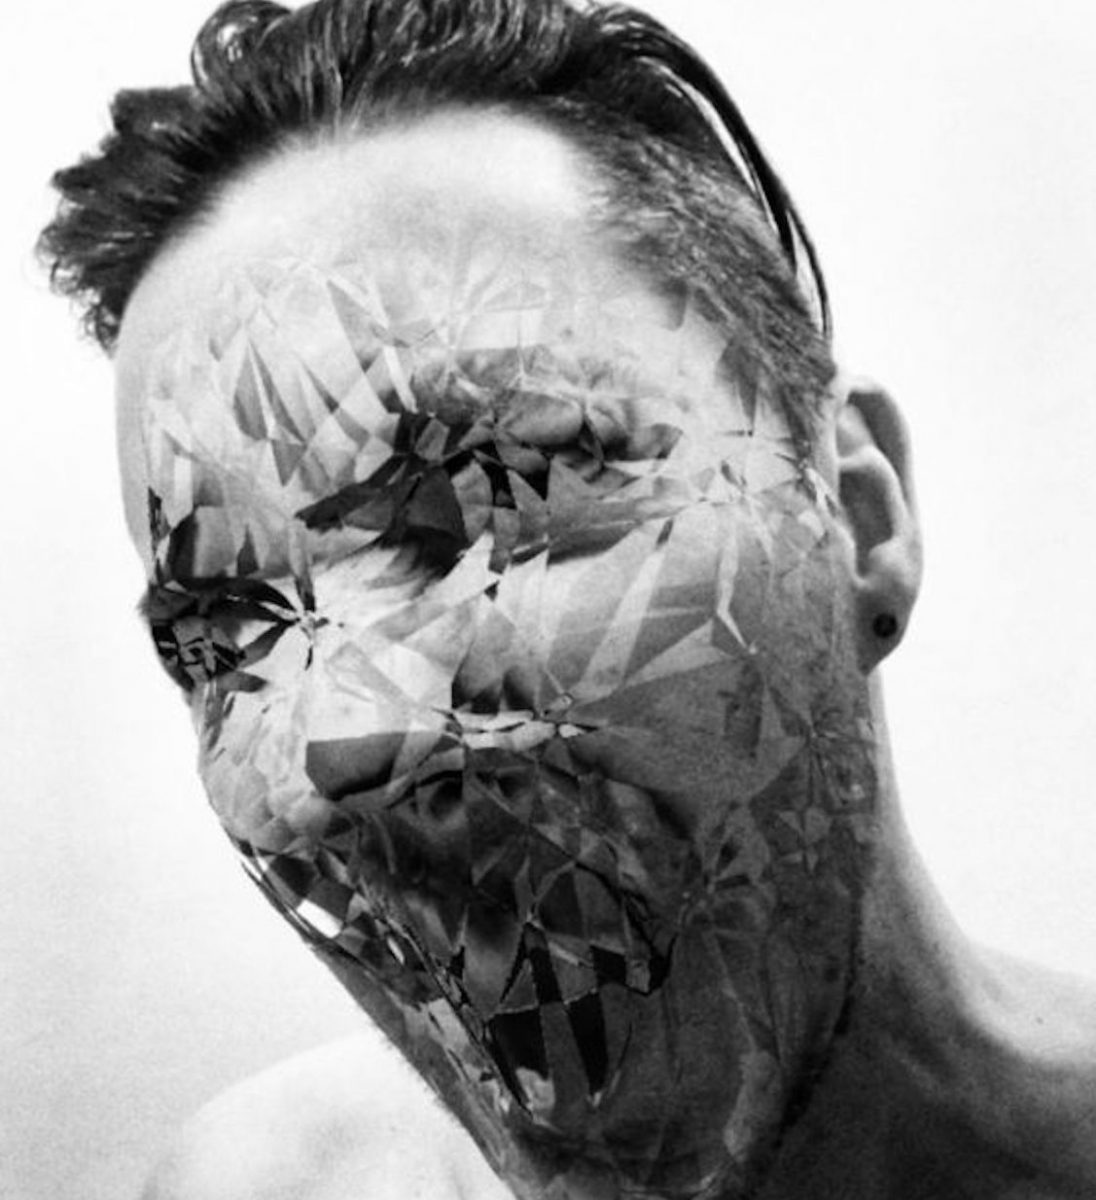 Slighter drops all new album'V O I D', check the video for'Complicit'